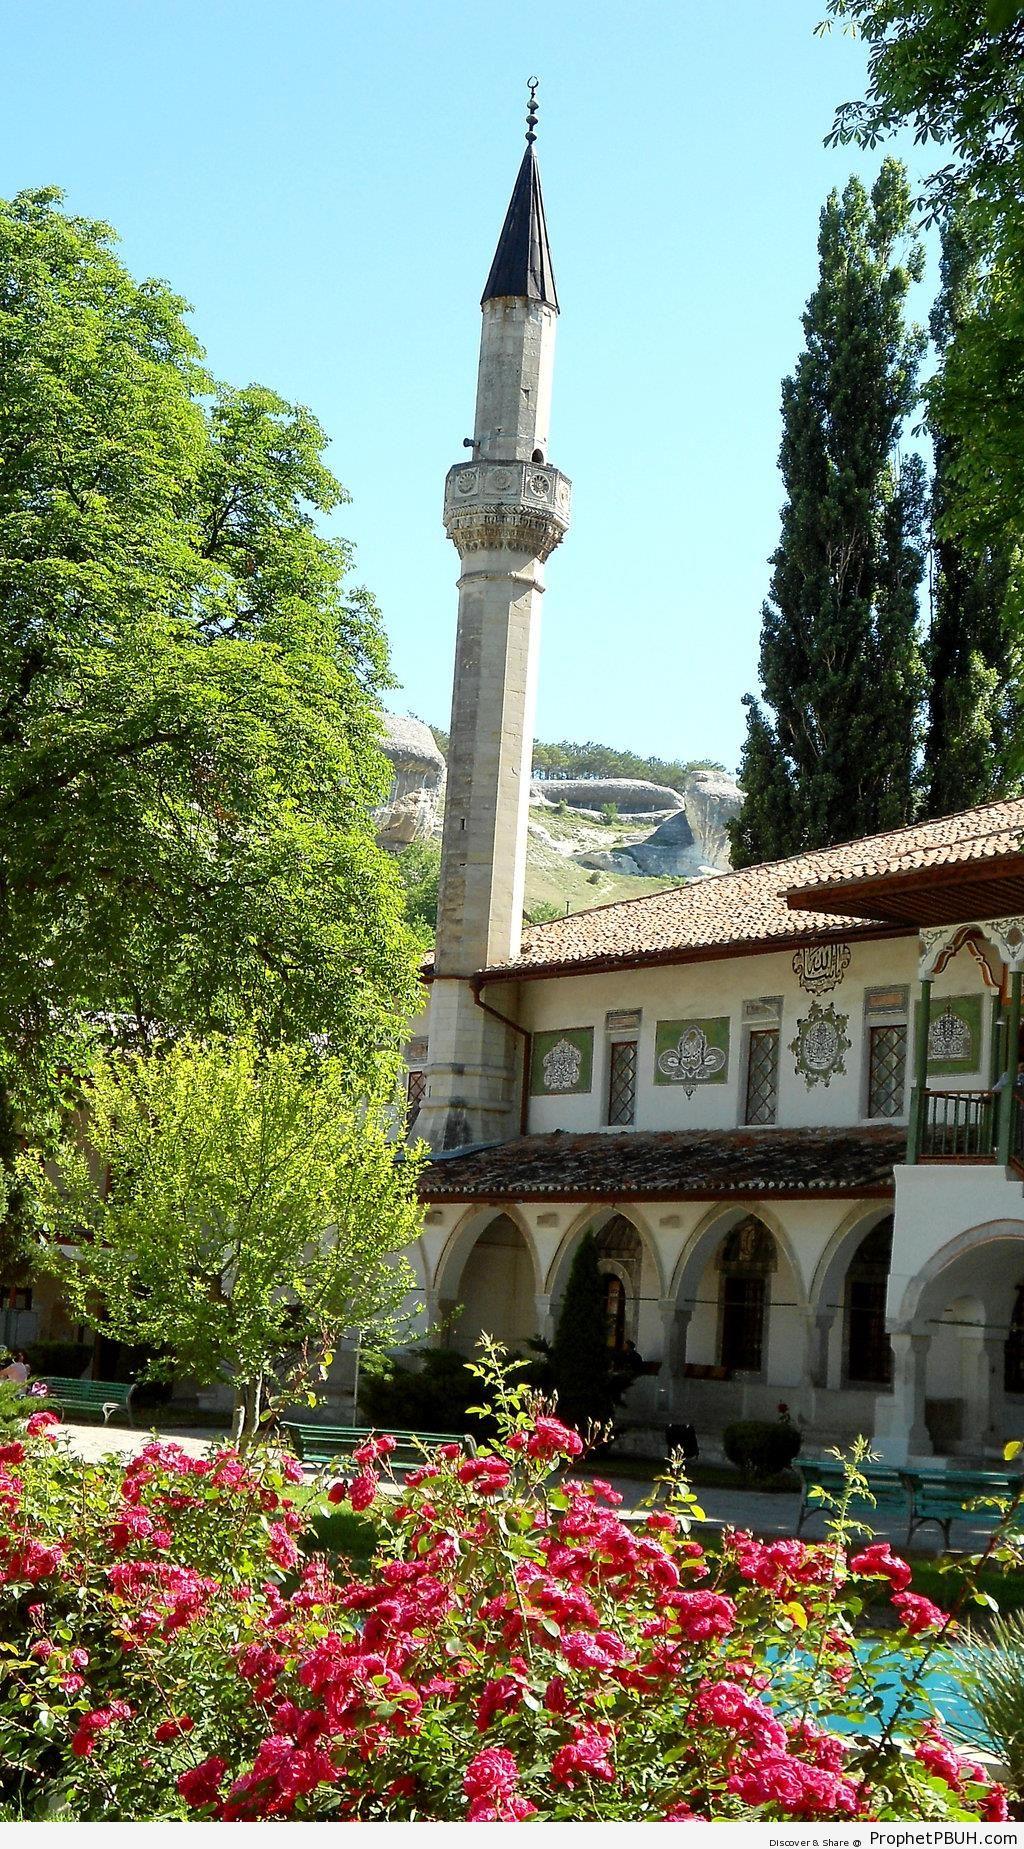 BÃyÃk Han Cami (The Big Khan Mosque) in Bakhchysarai, Ukraine - Bakhchysarai, Crimea, Ukraine -Picture